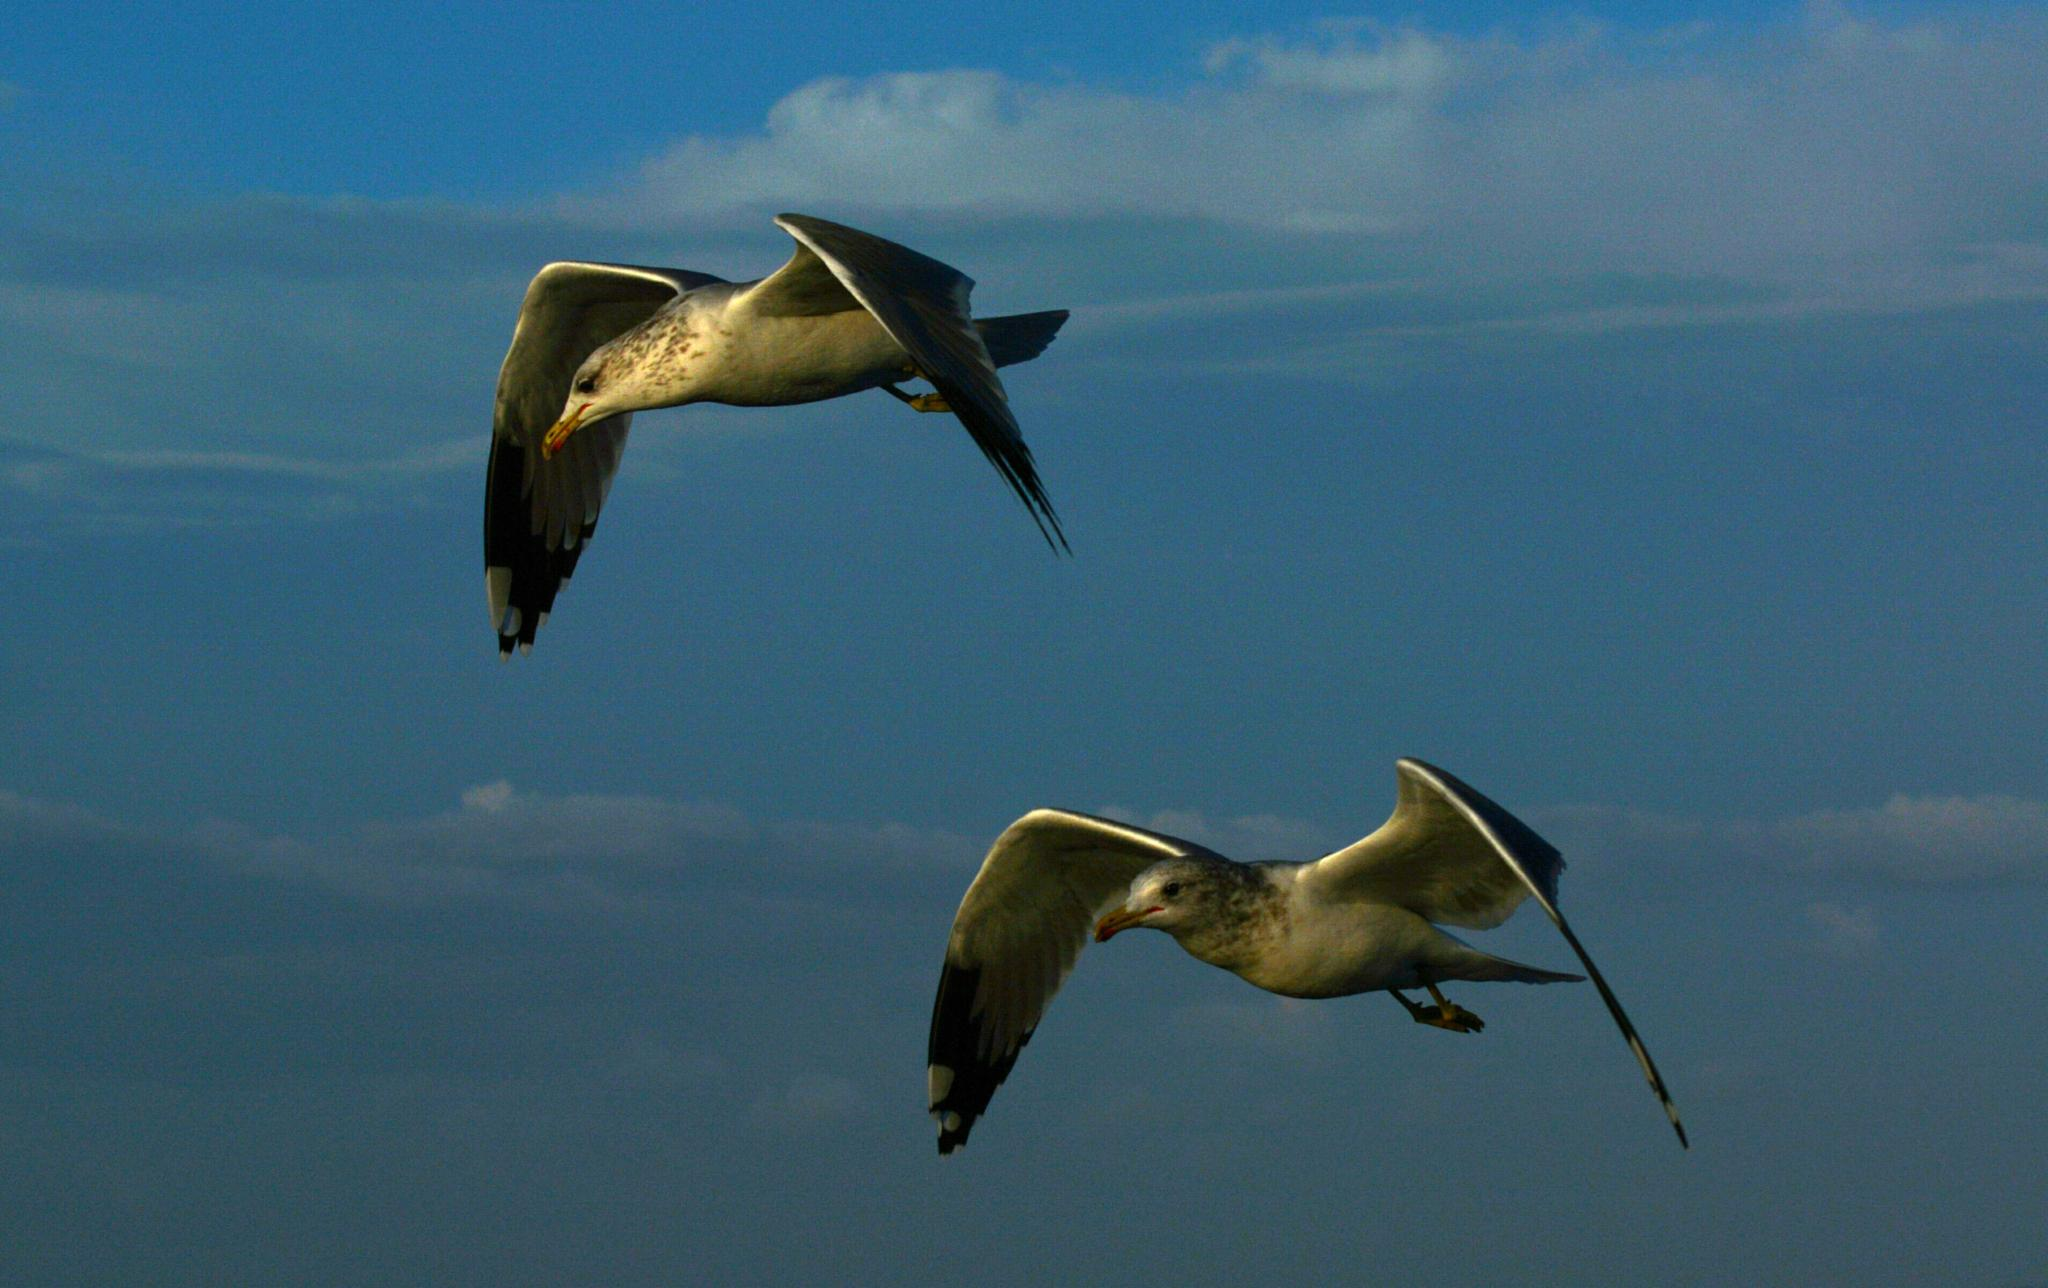 Seagulls Inflight by Gerard Francis Corbett